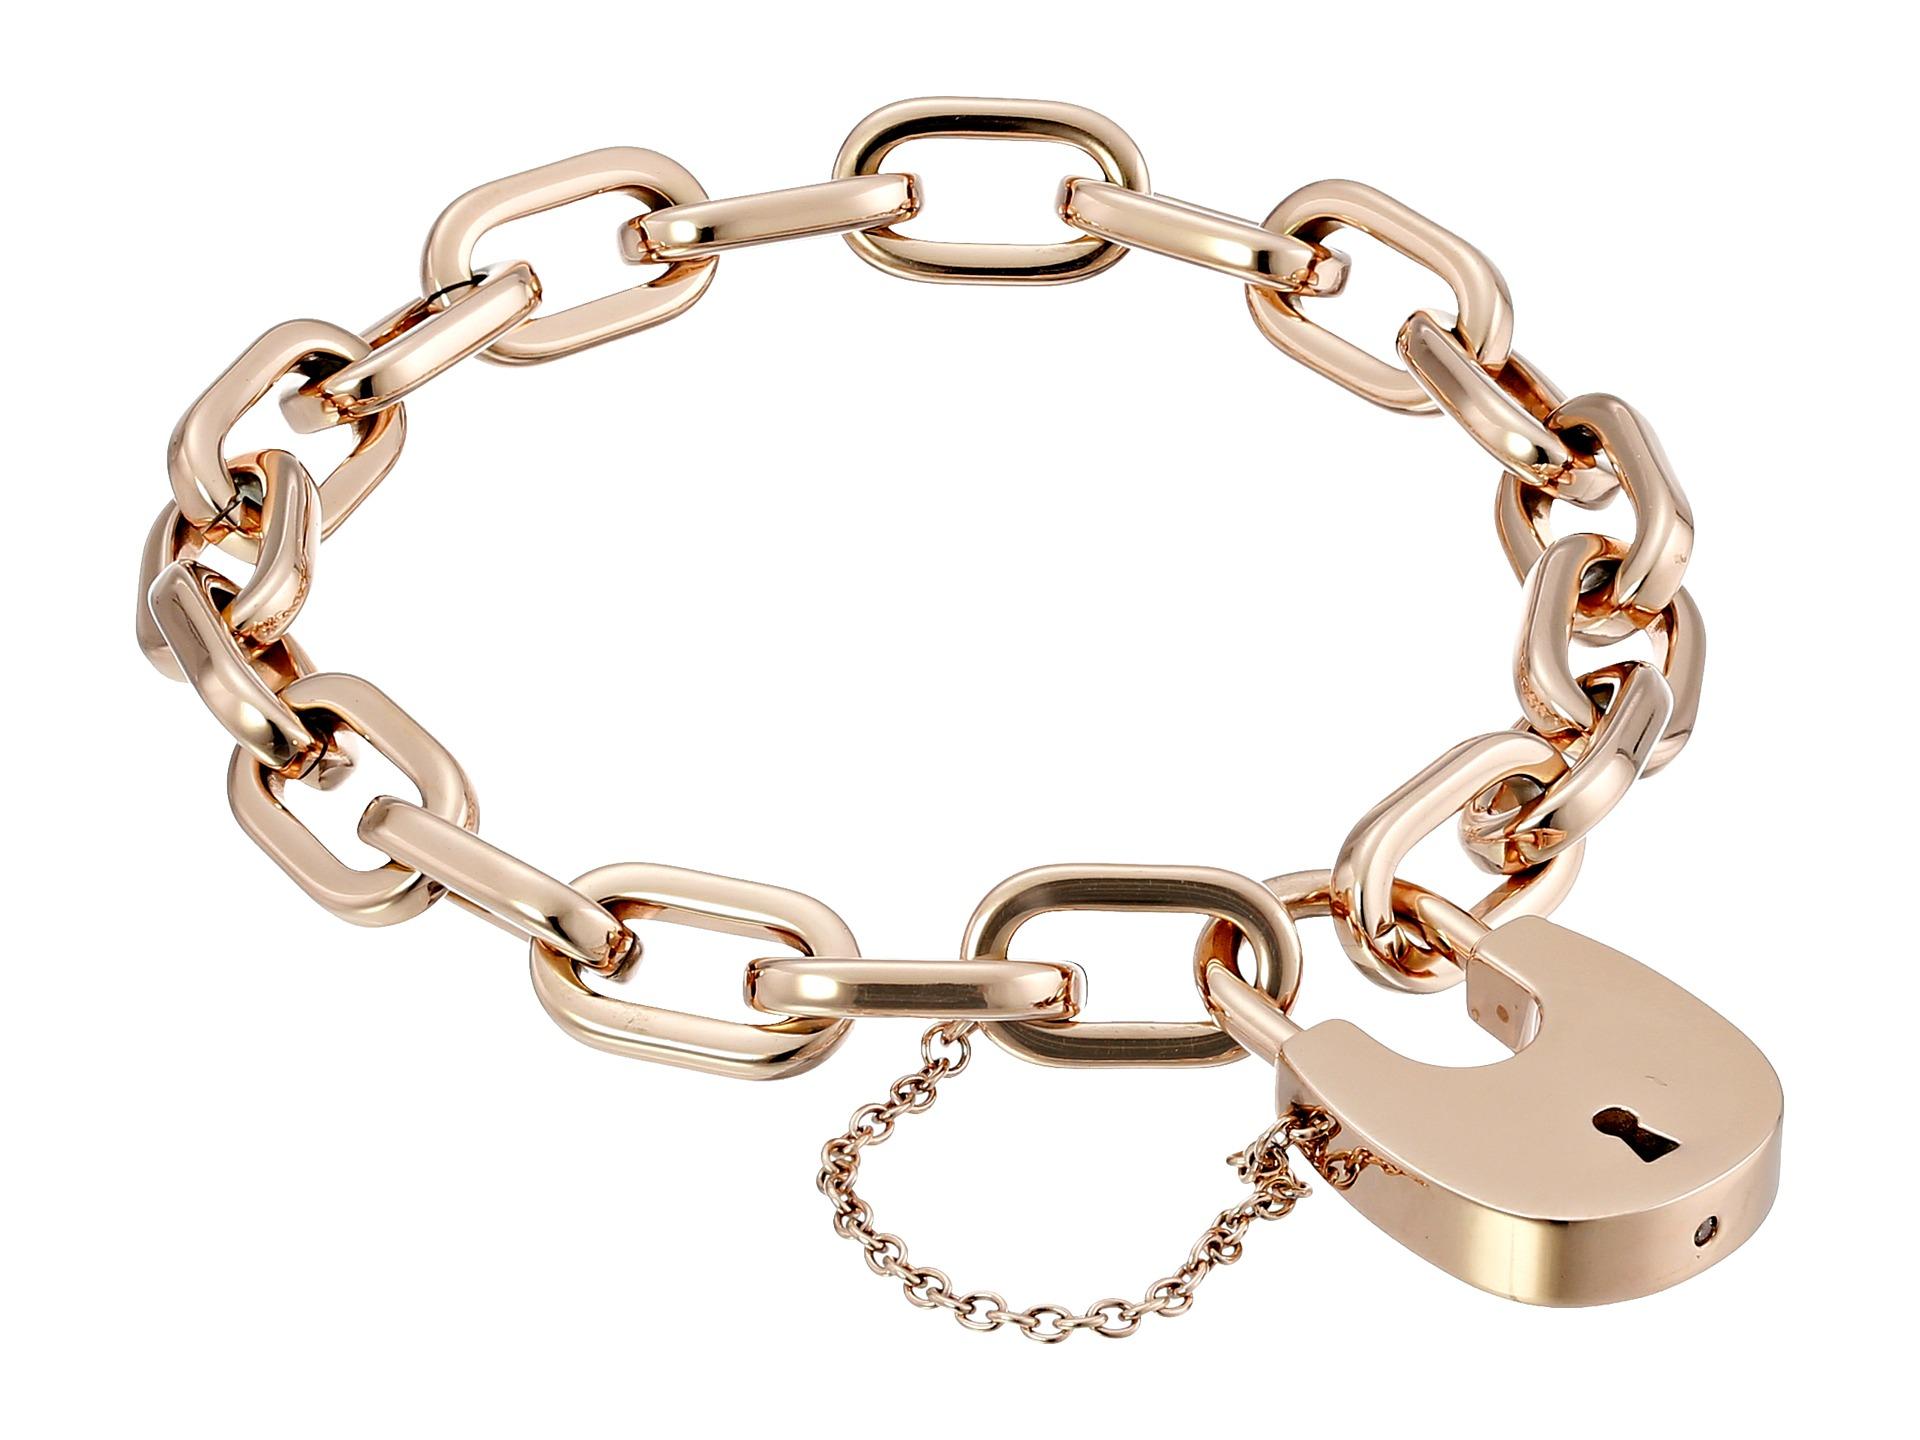 michael kors rosegold armband michael kors armband rose. Black Bedroom Furniture Sets. Home Design Ideas